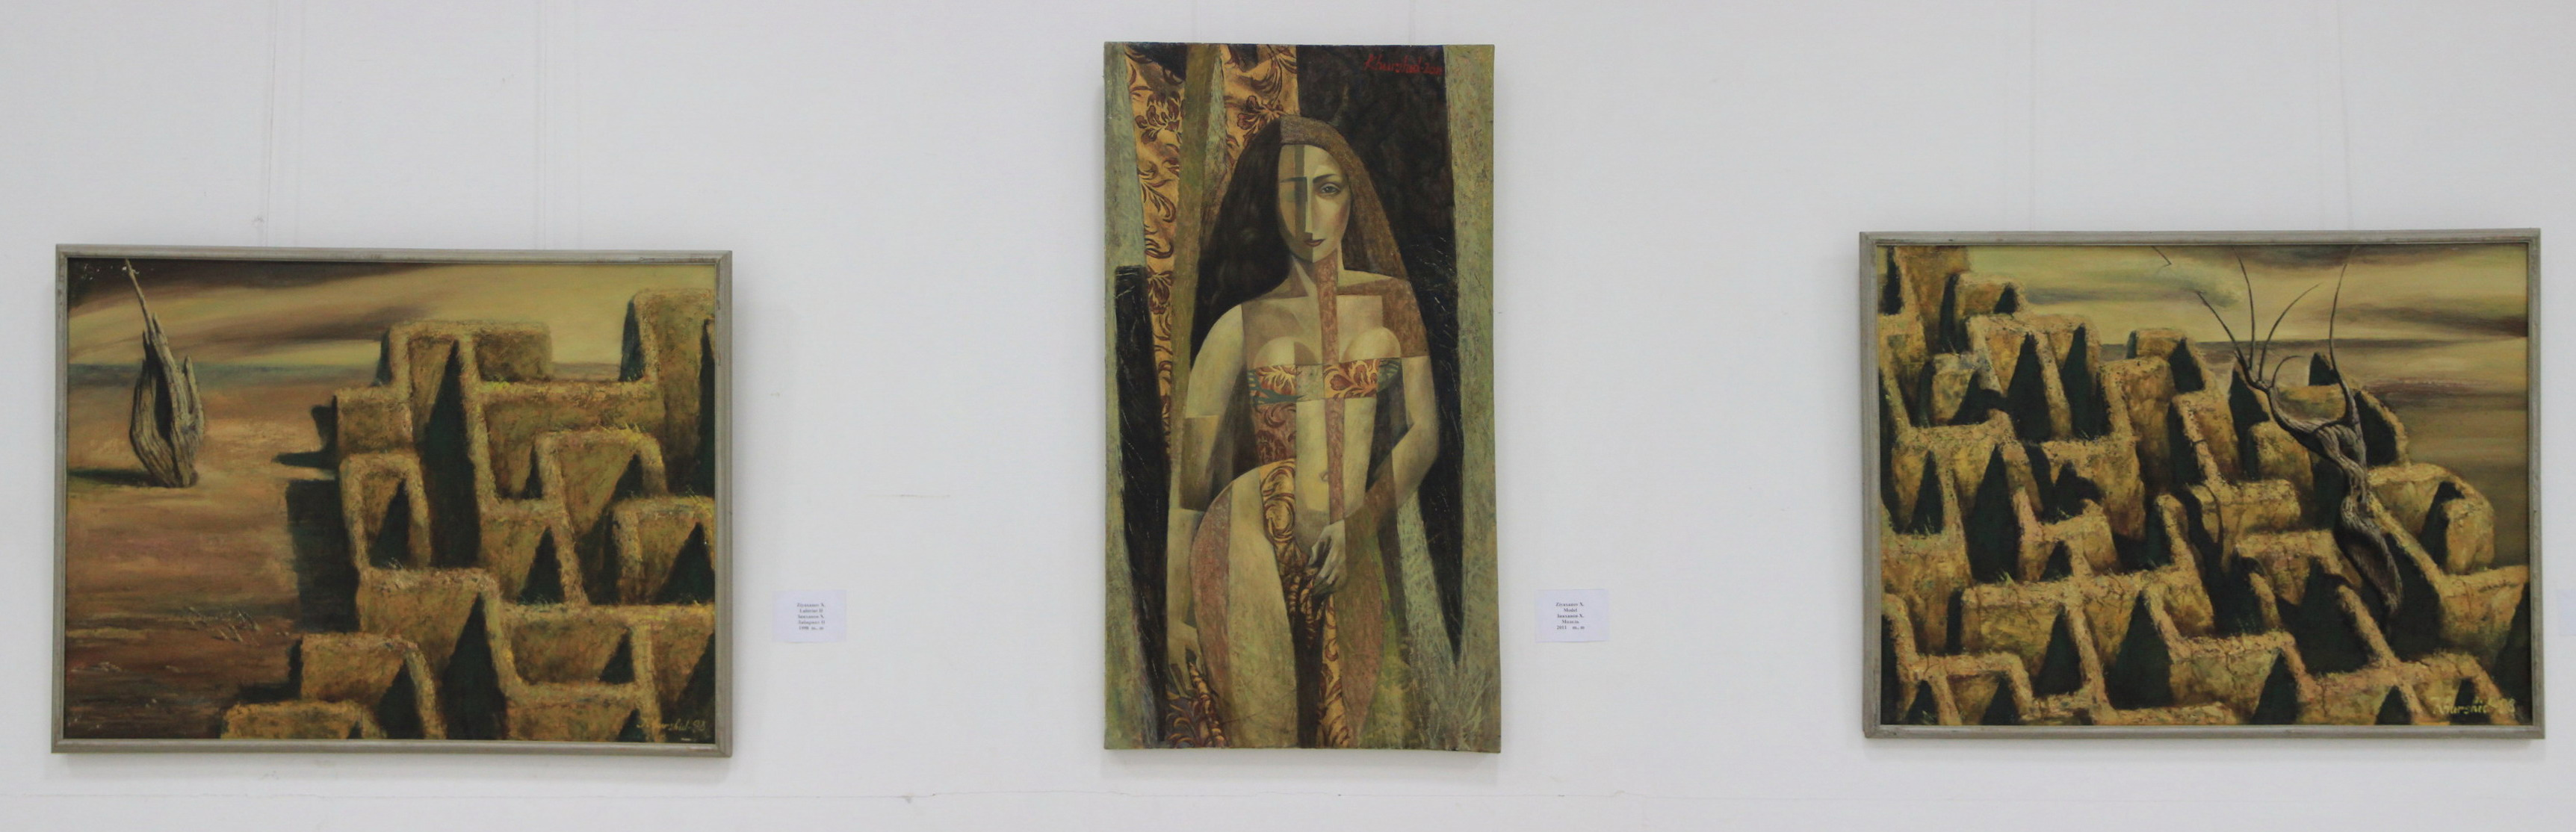 Зияханов Хуршид. Лабиринт 2. 1995, Модель. 2011, Лабиринт. 2011